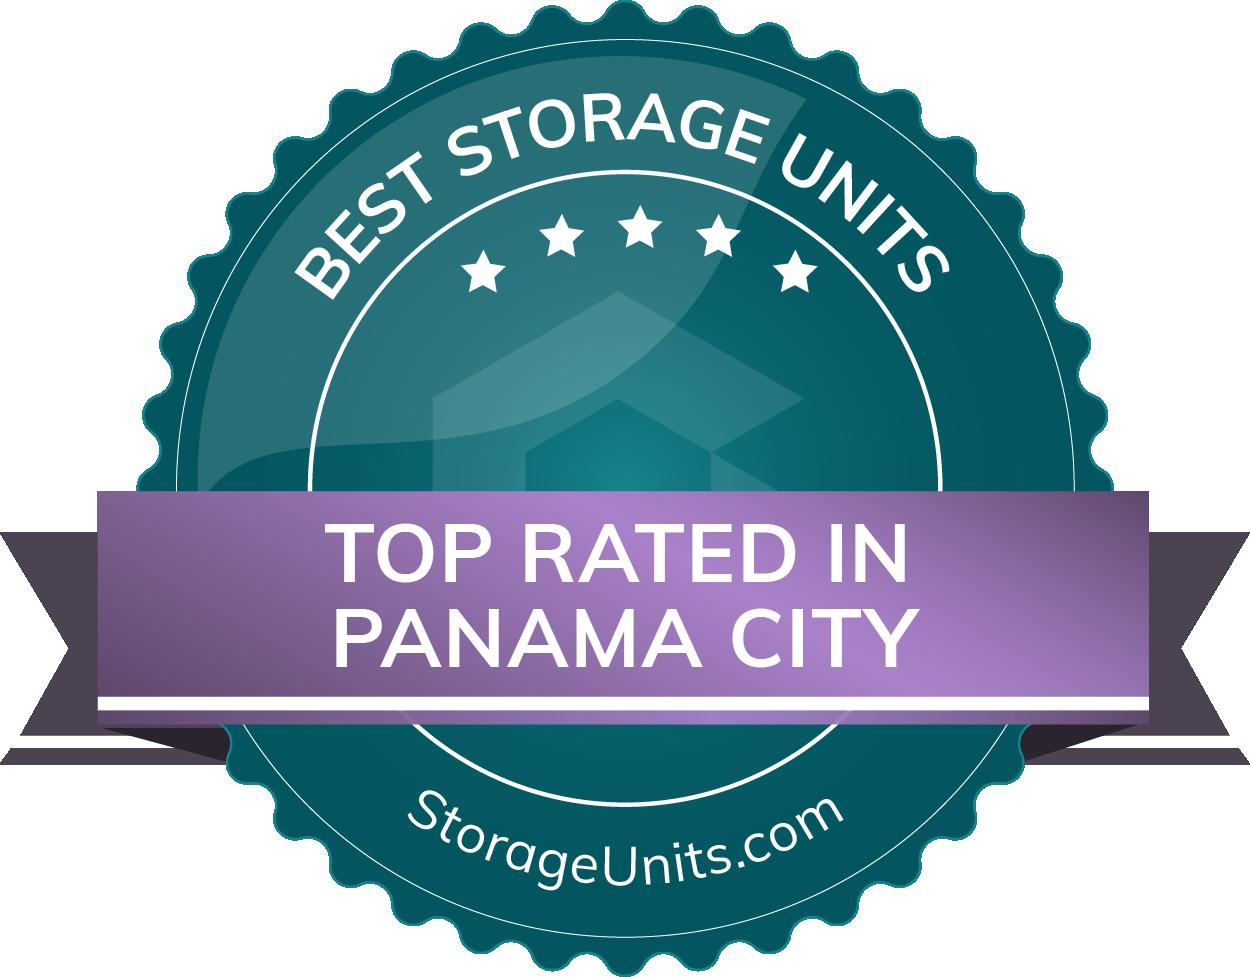 Best Self Storage Units in Panama City, FL